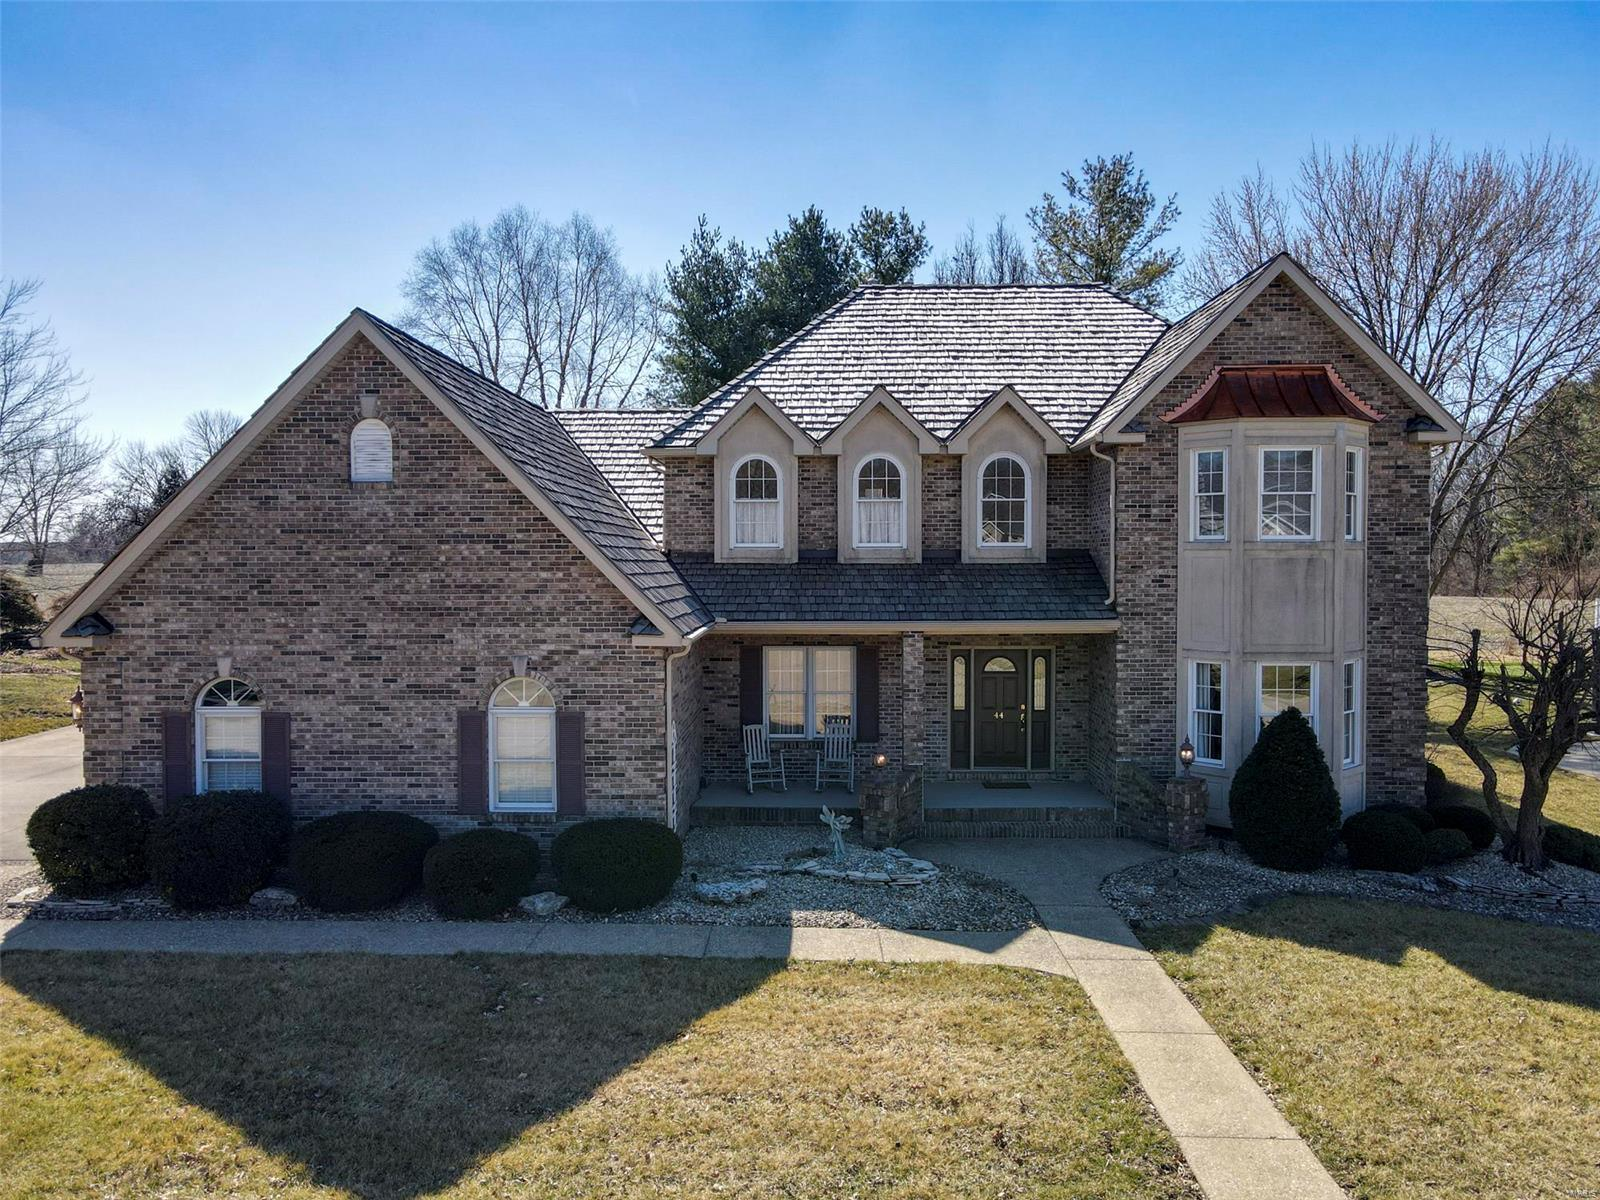 44 Kingsley Way Property Photo - Glen Carbon, IL real estate listing